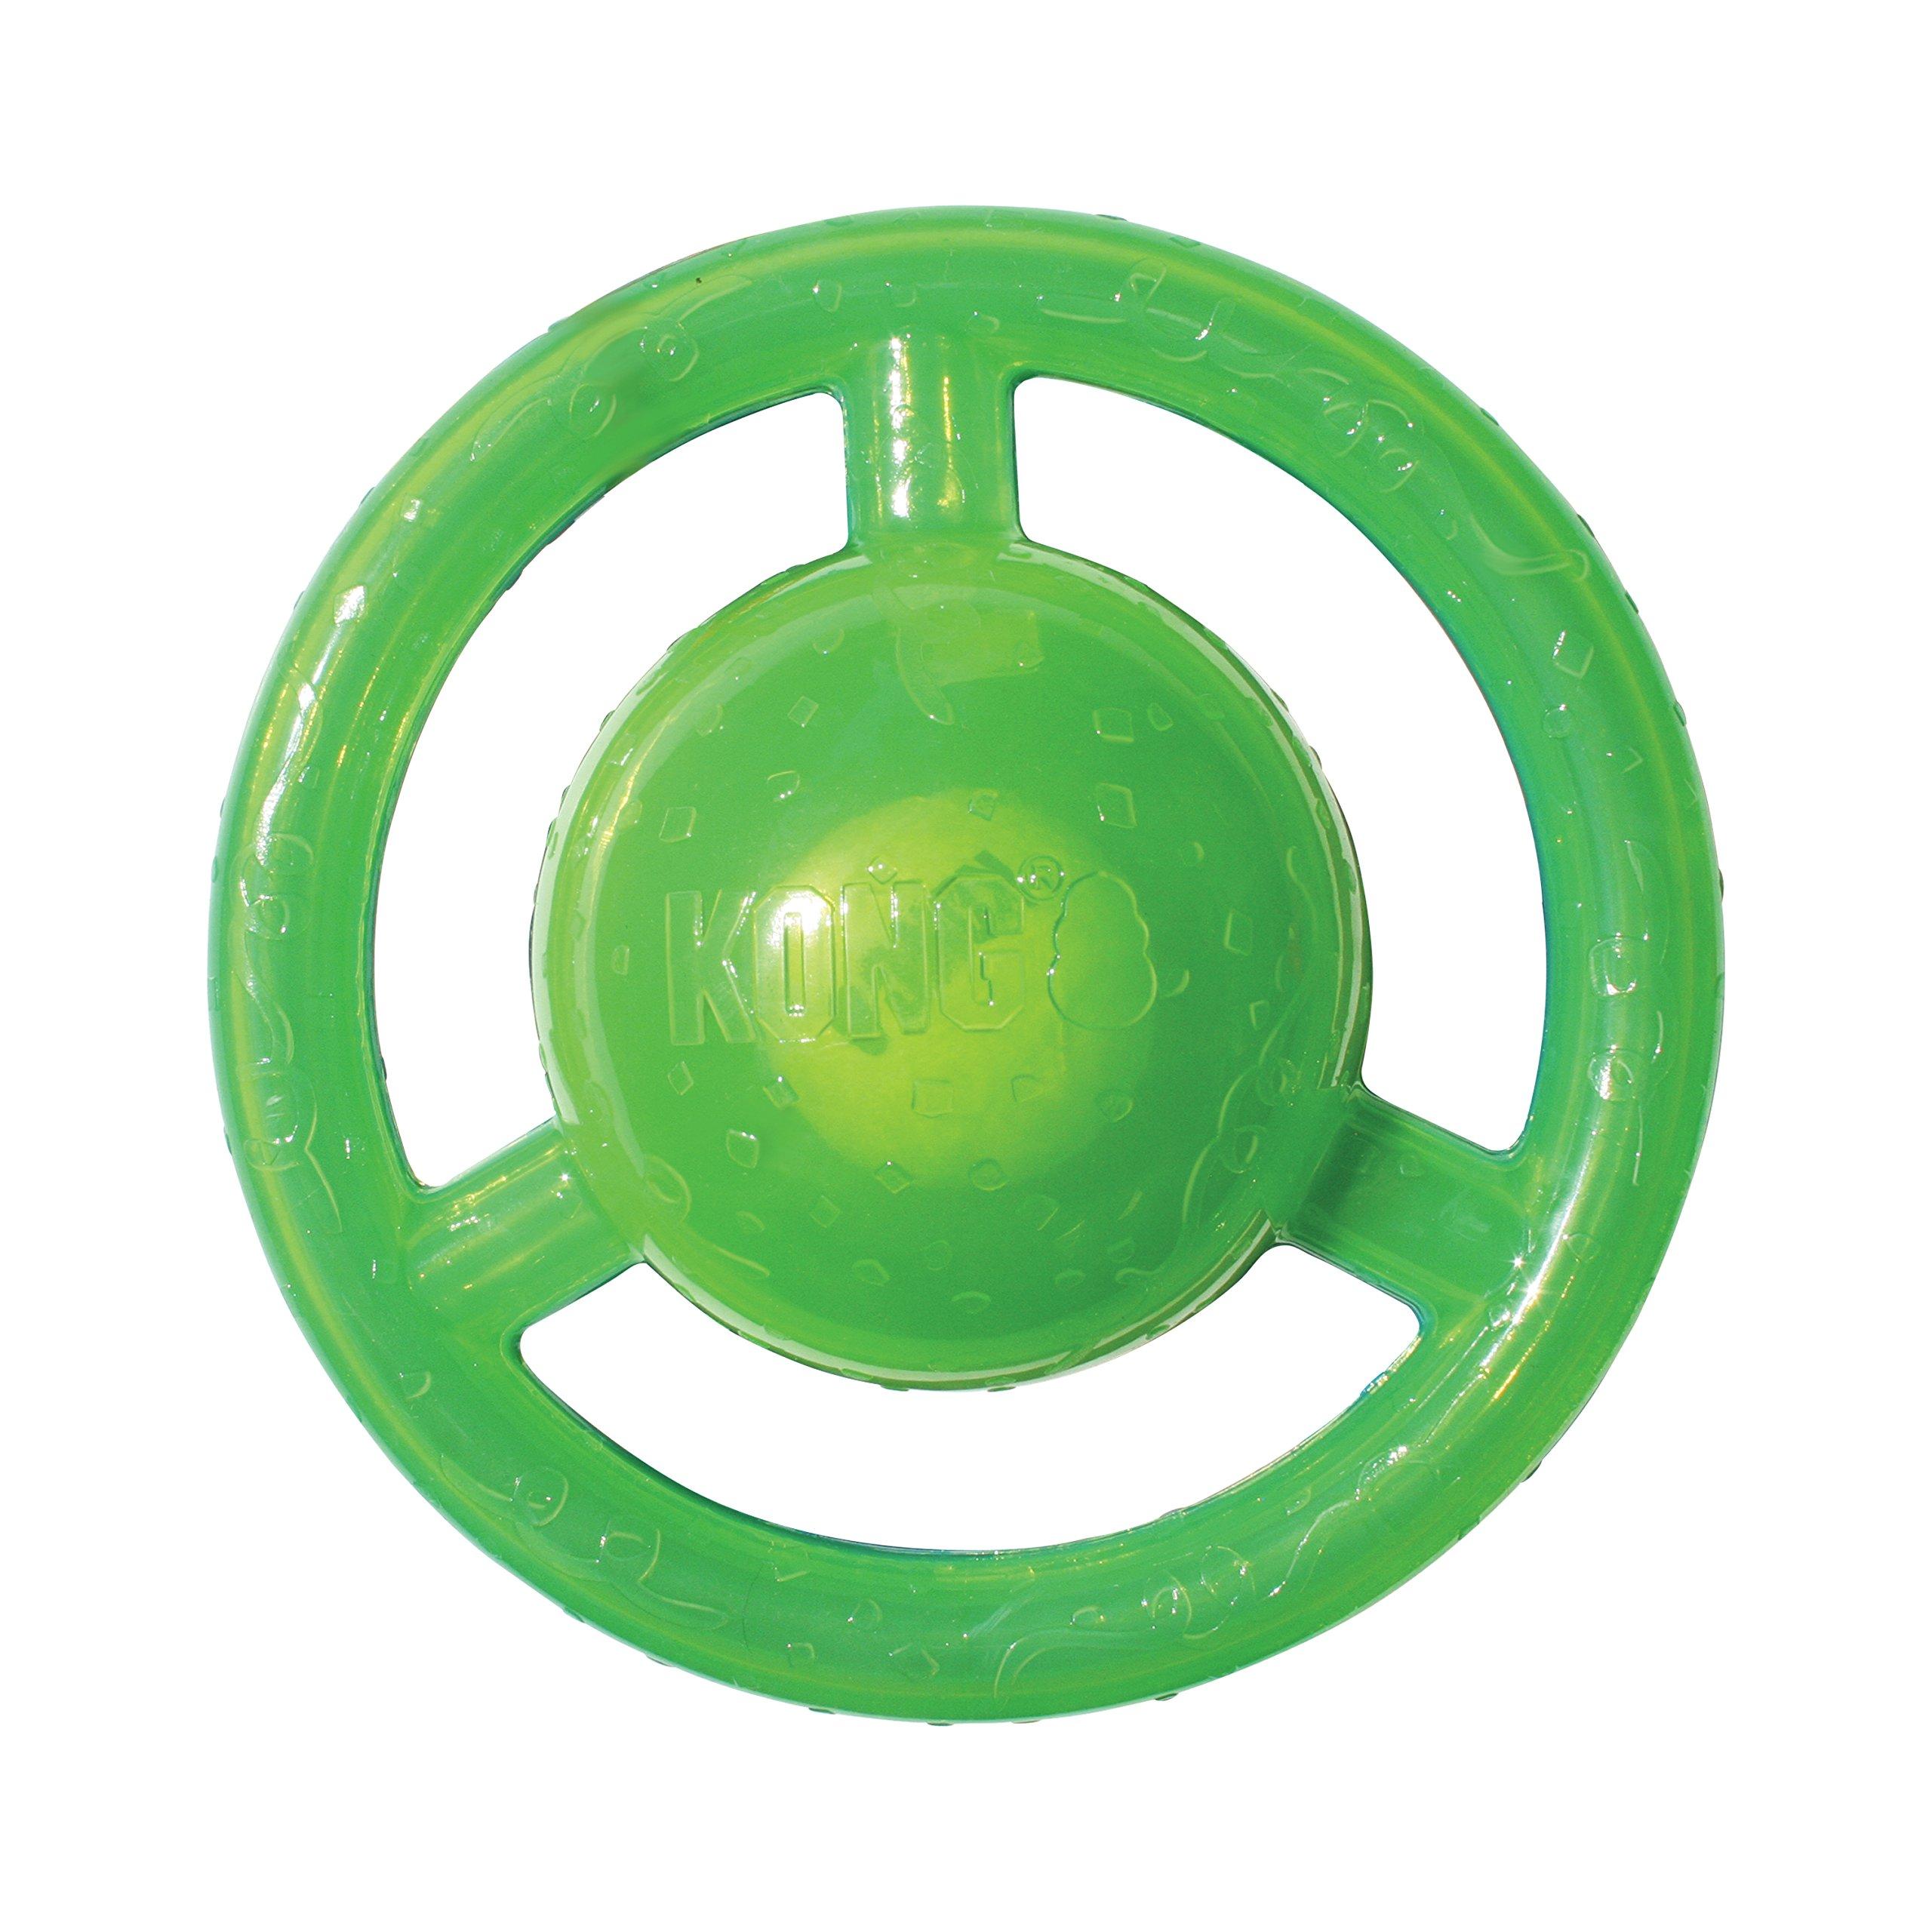 KONG Jumbler Disc Dog Toy, Medium/Large by KONG (Image #1)